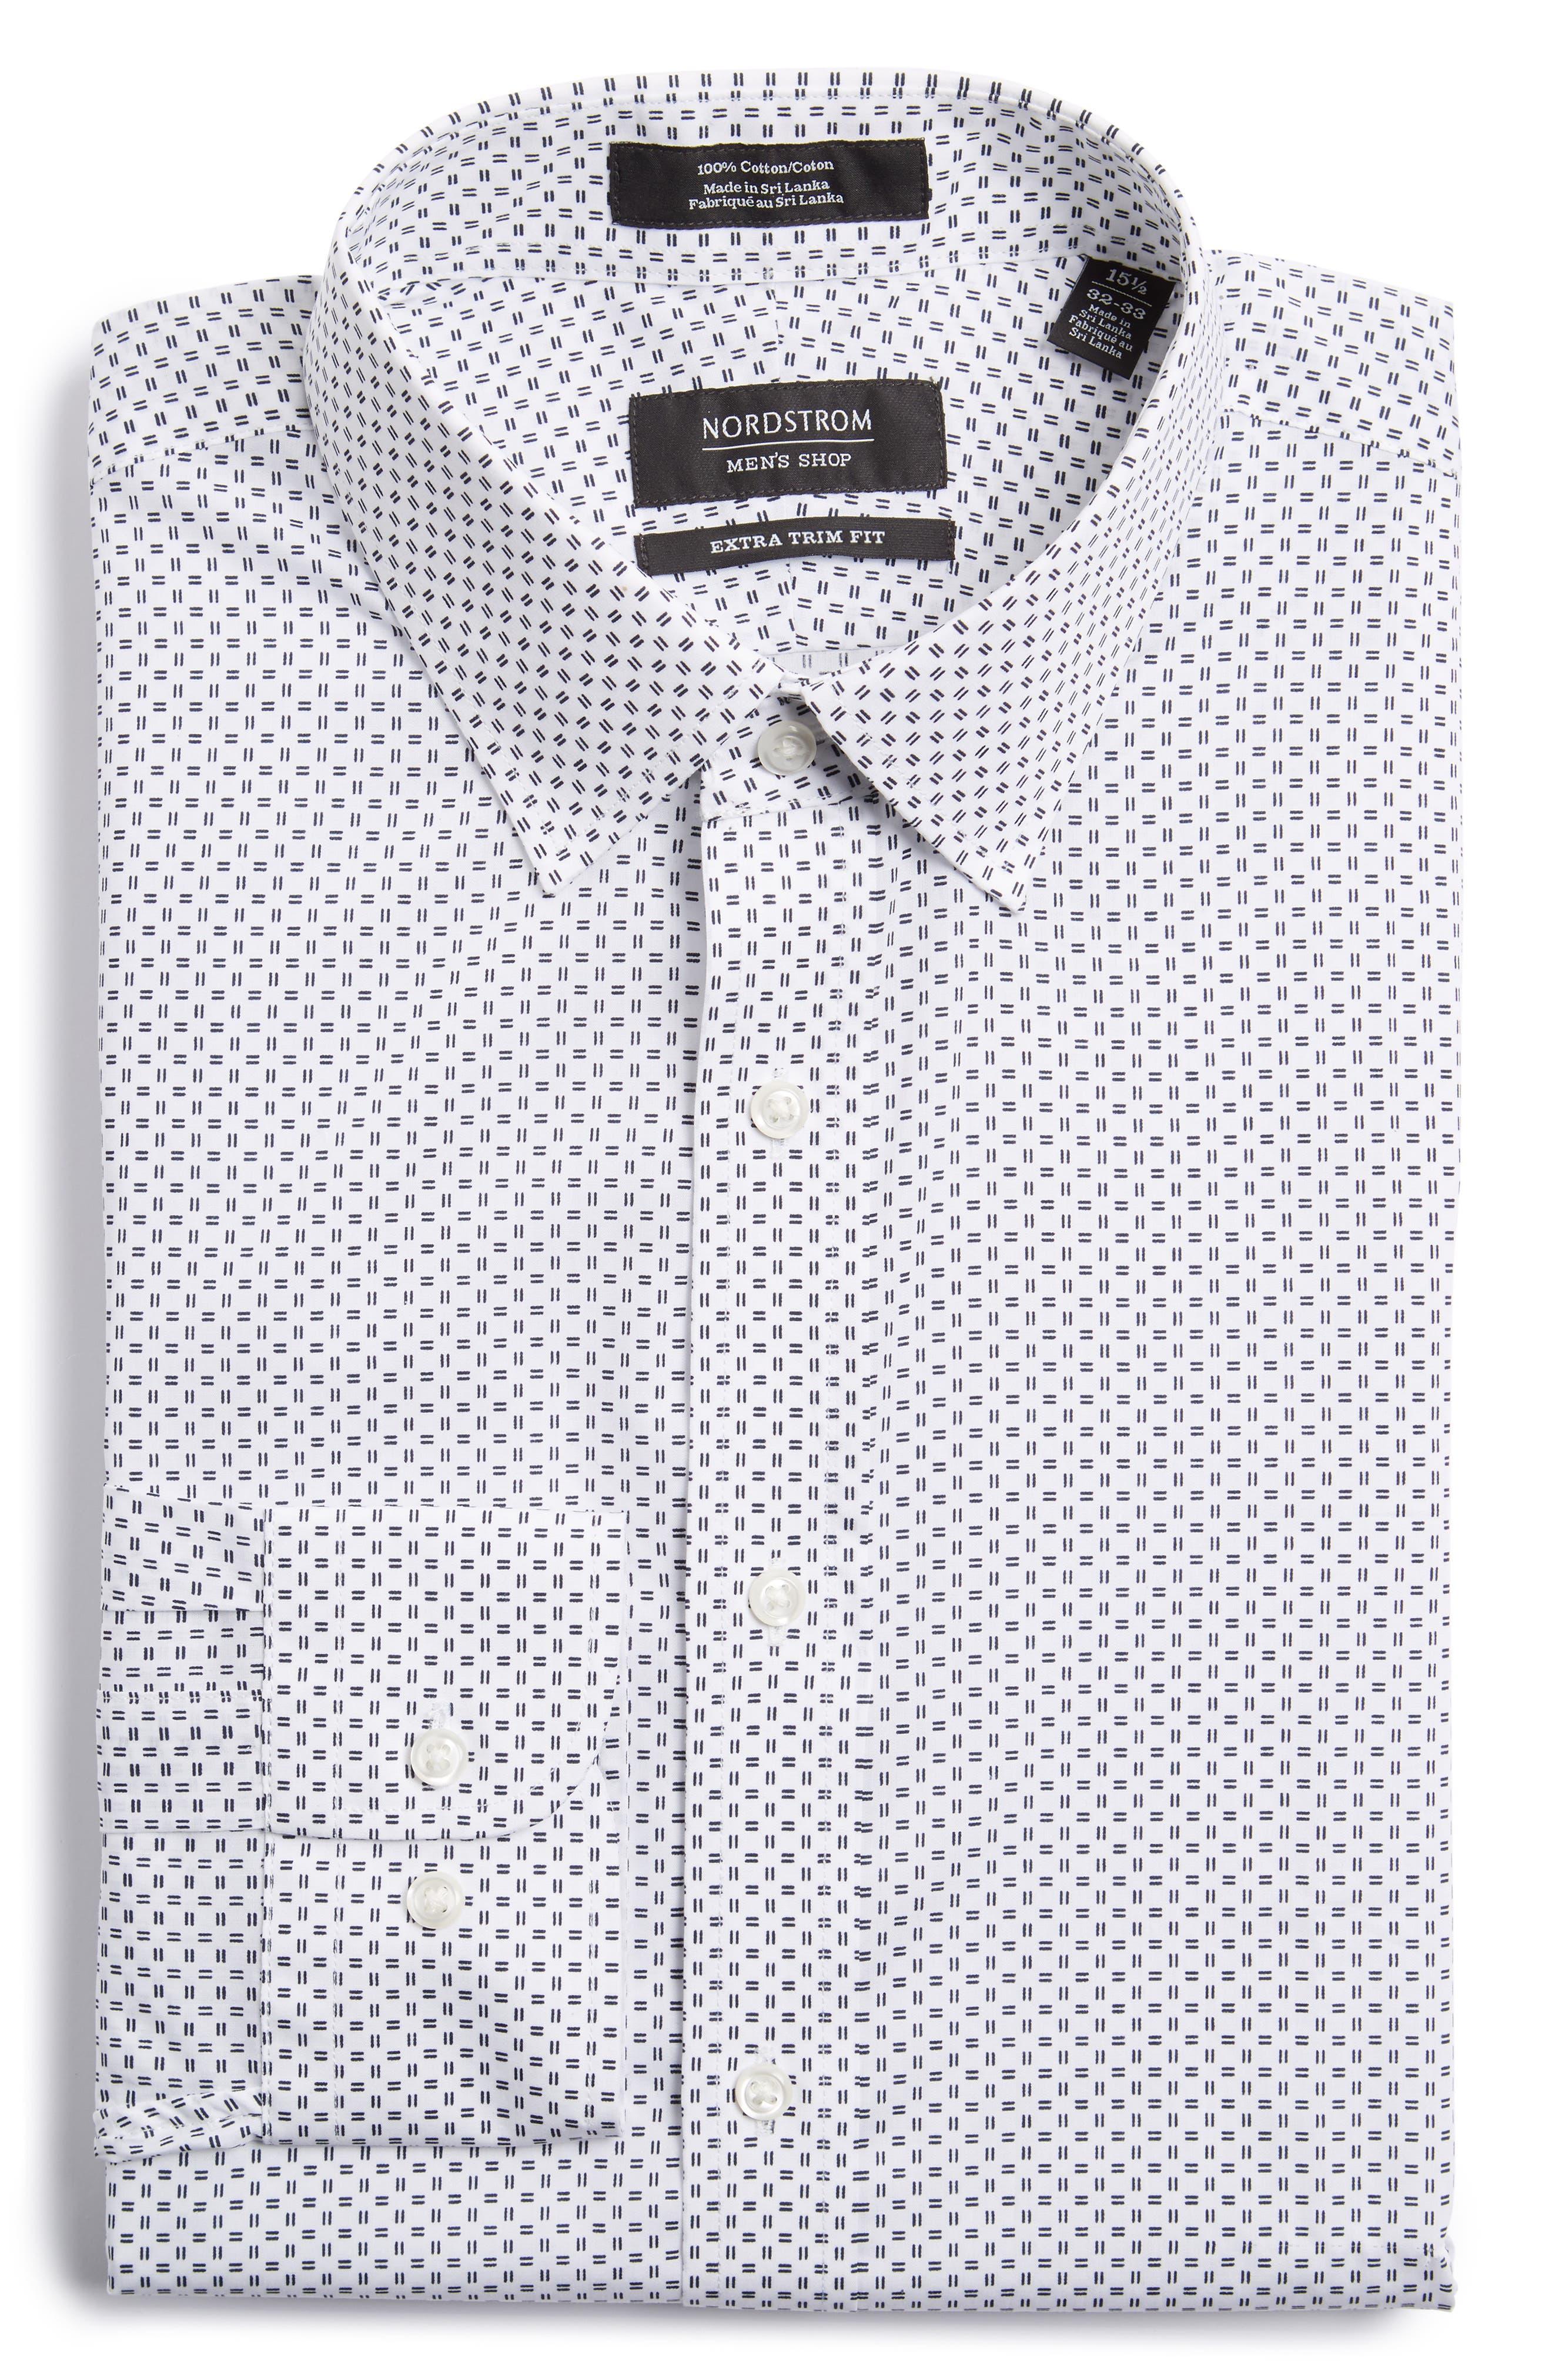 Nordstrom Men's Shop Extra Trim Fit Dress Shirt